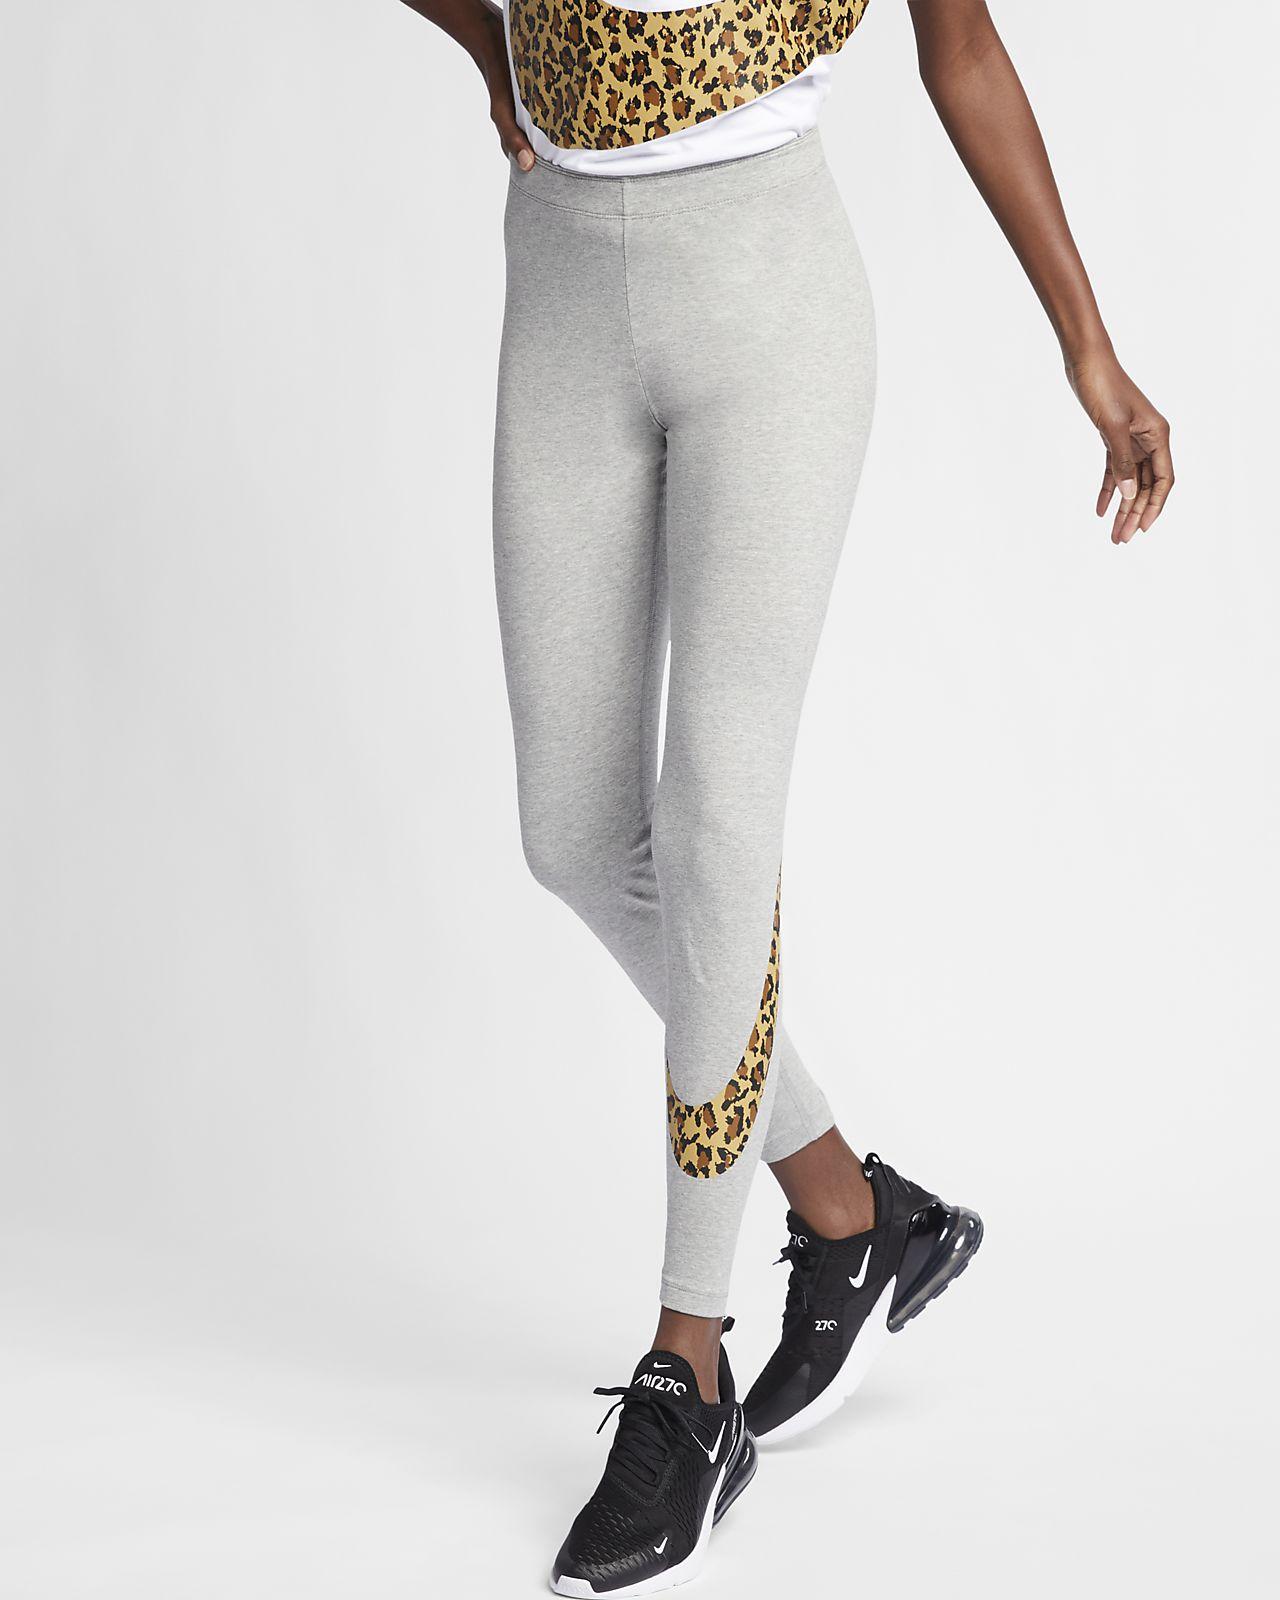 Leggings com estampado animal Nike Sportswear para mulher